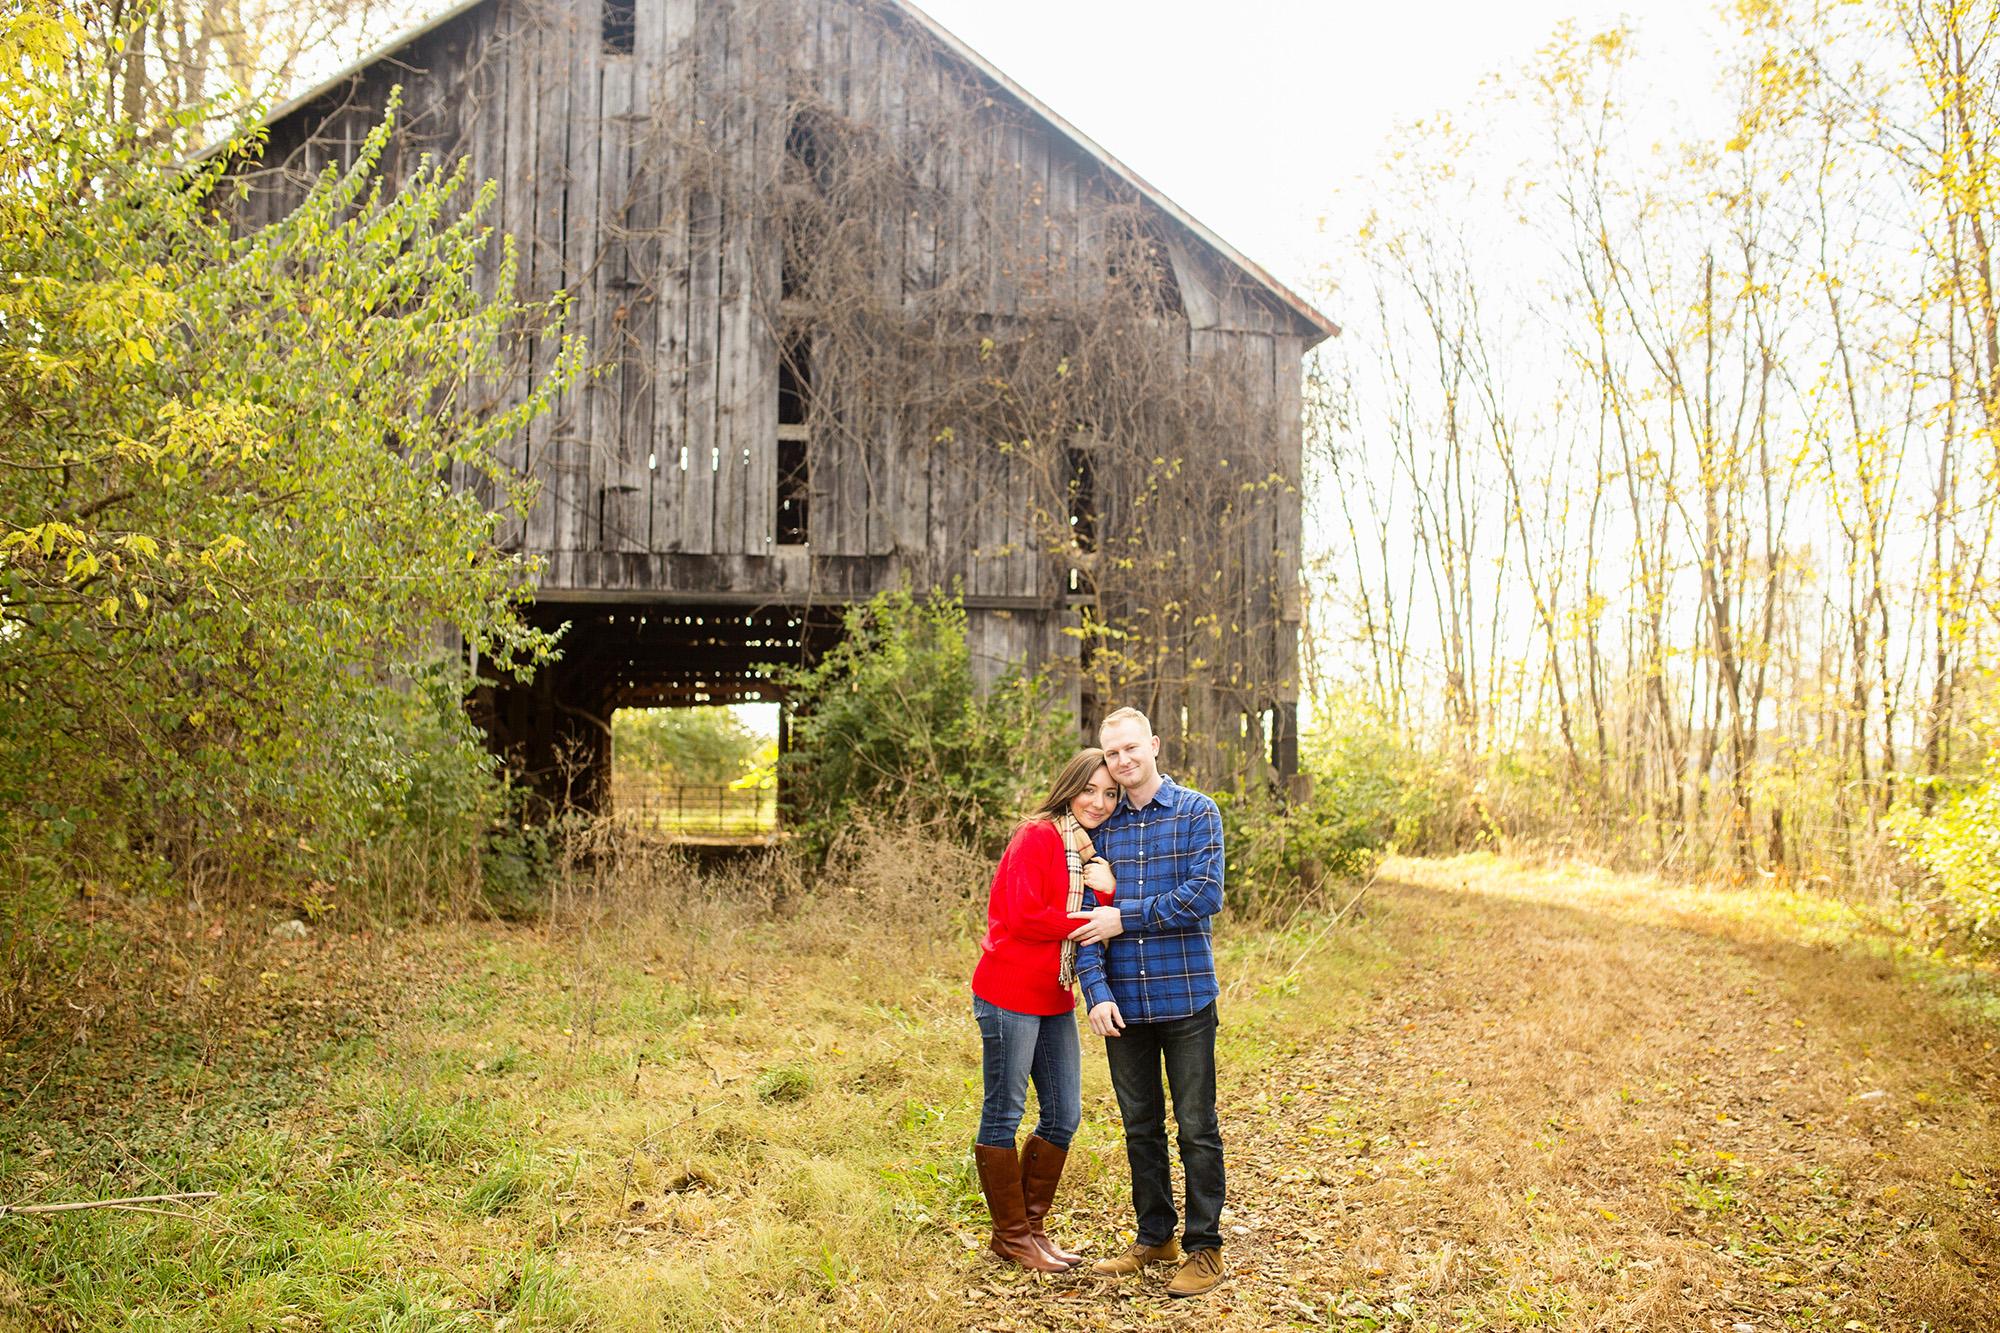 Seriously_Sabrina_Photography_Lexington_Kentucky_Backroads_Roadtrip_Engagement_RM026.jpg